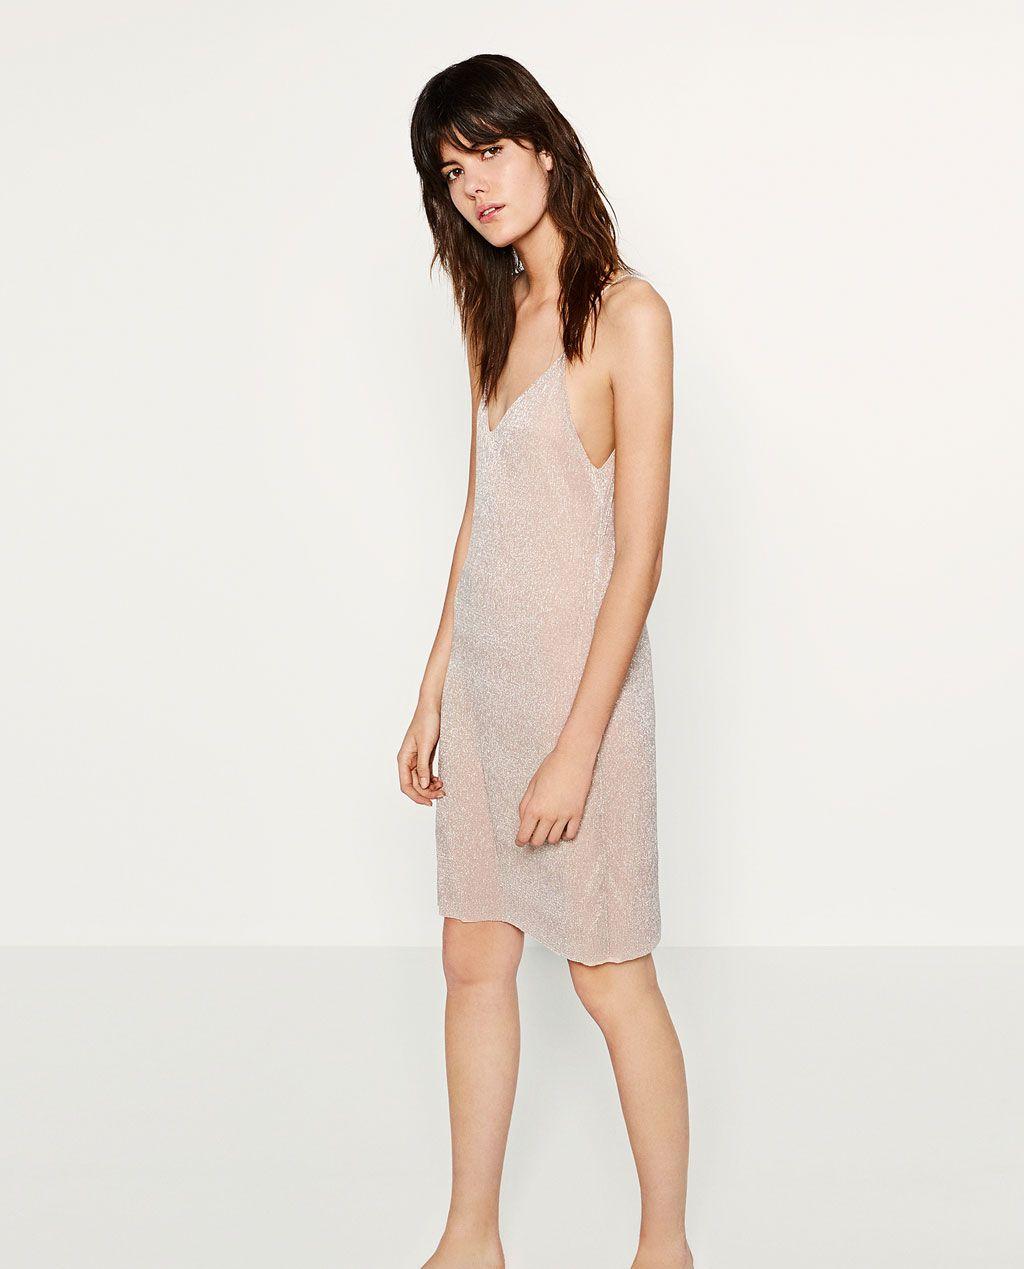 1 Dress Dresses Image Shimmer From ZaraSummer Of Thread Style 3AjL5q4R